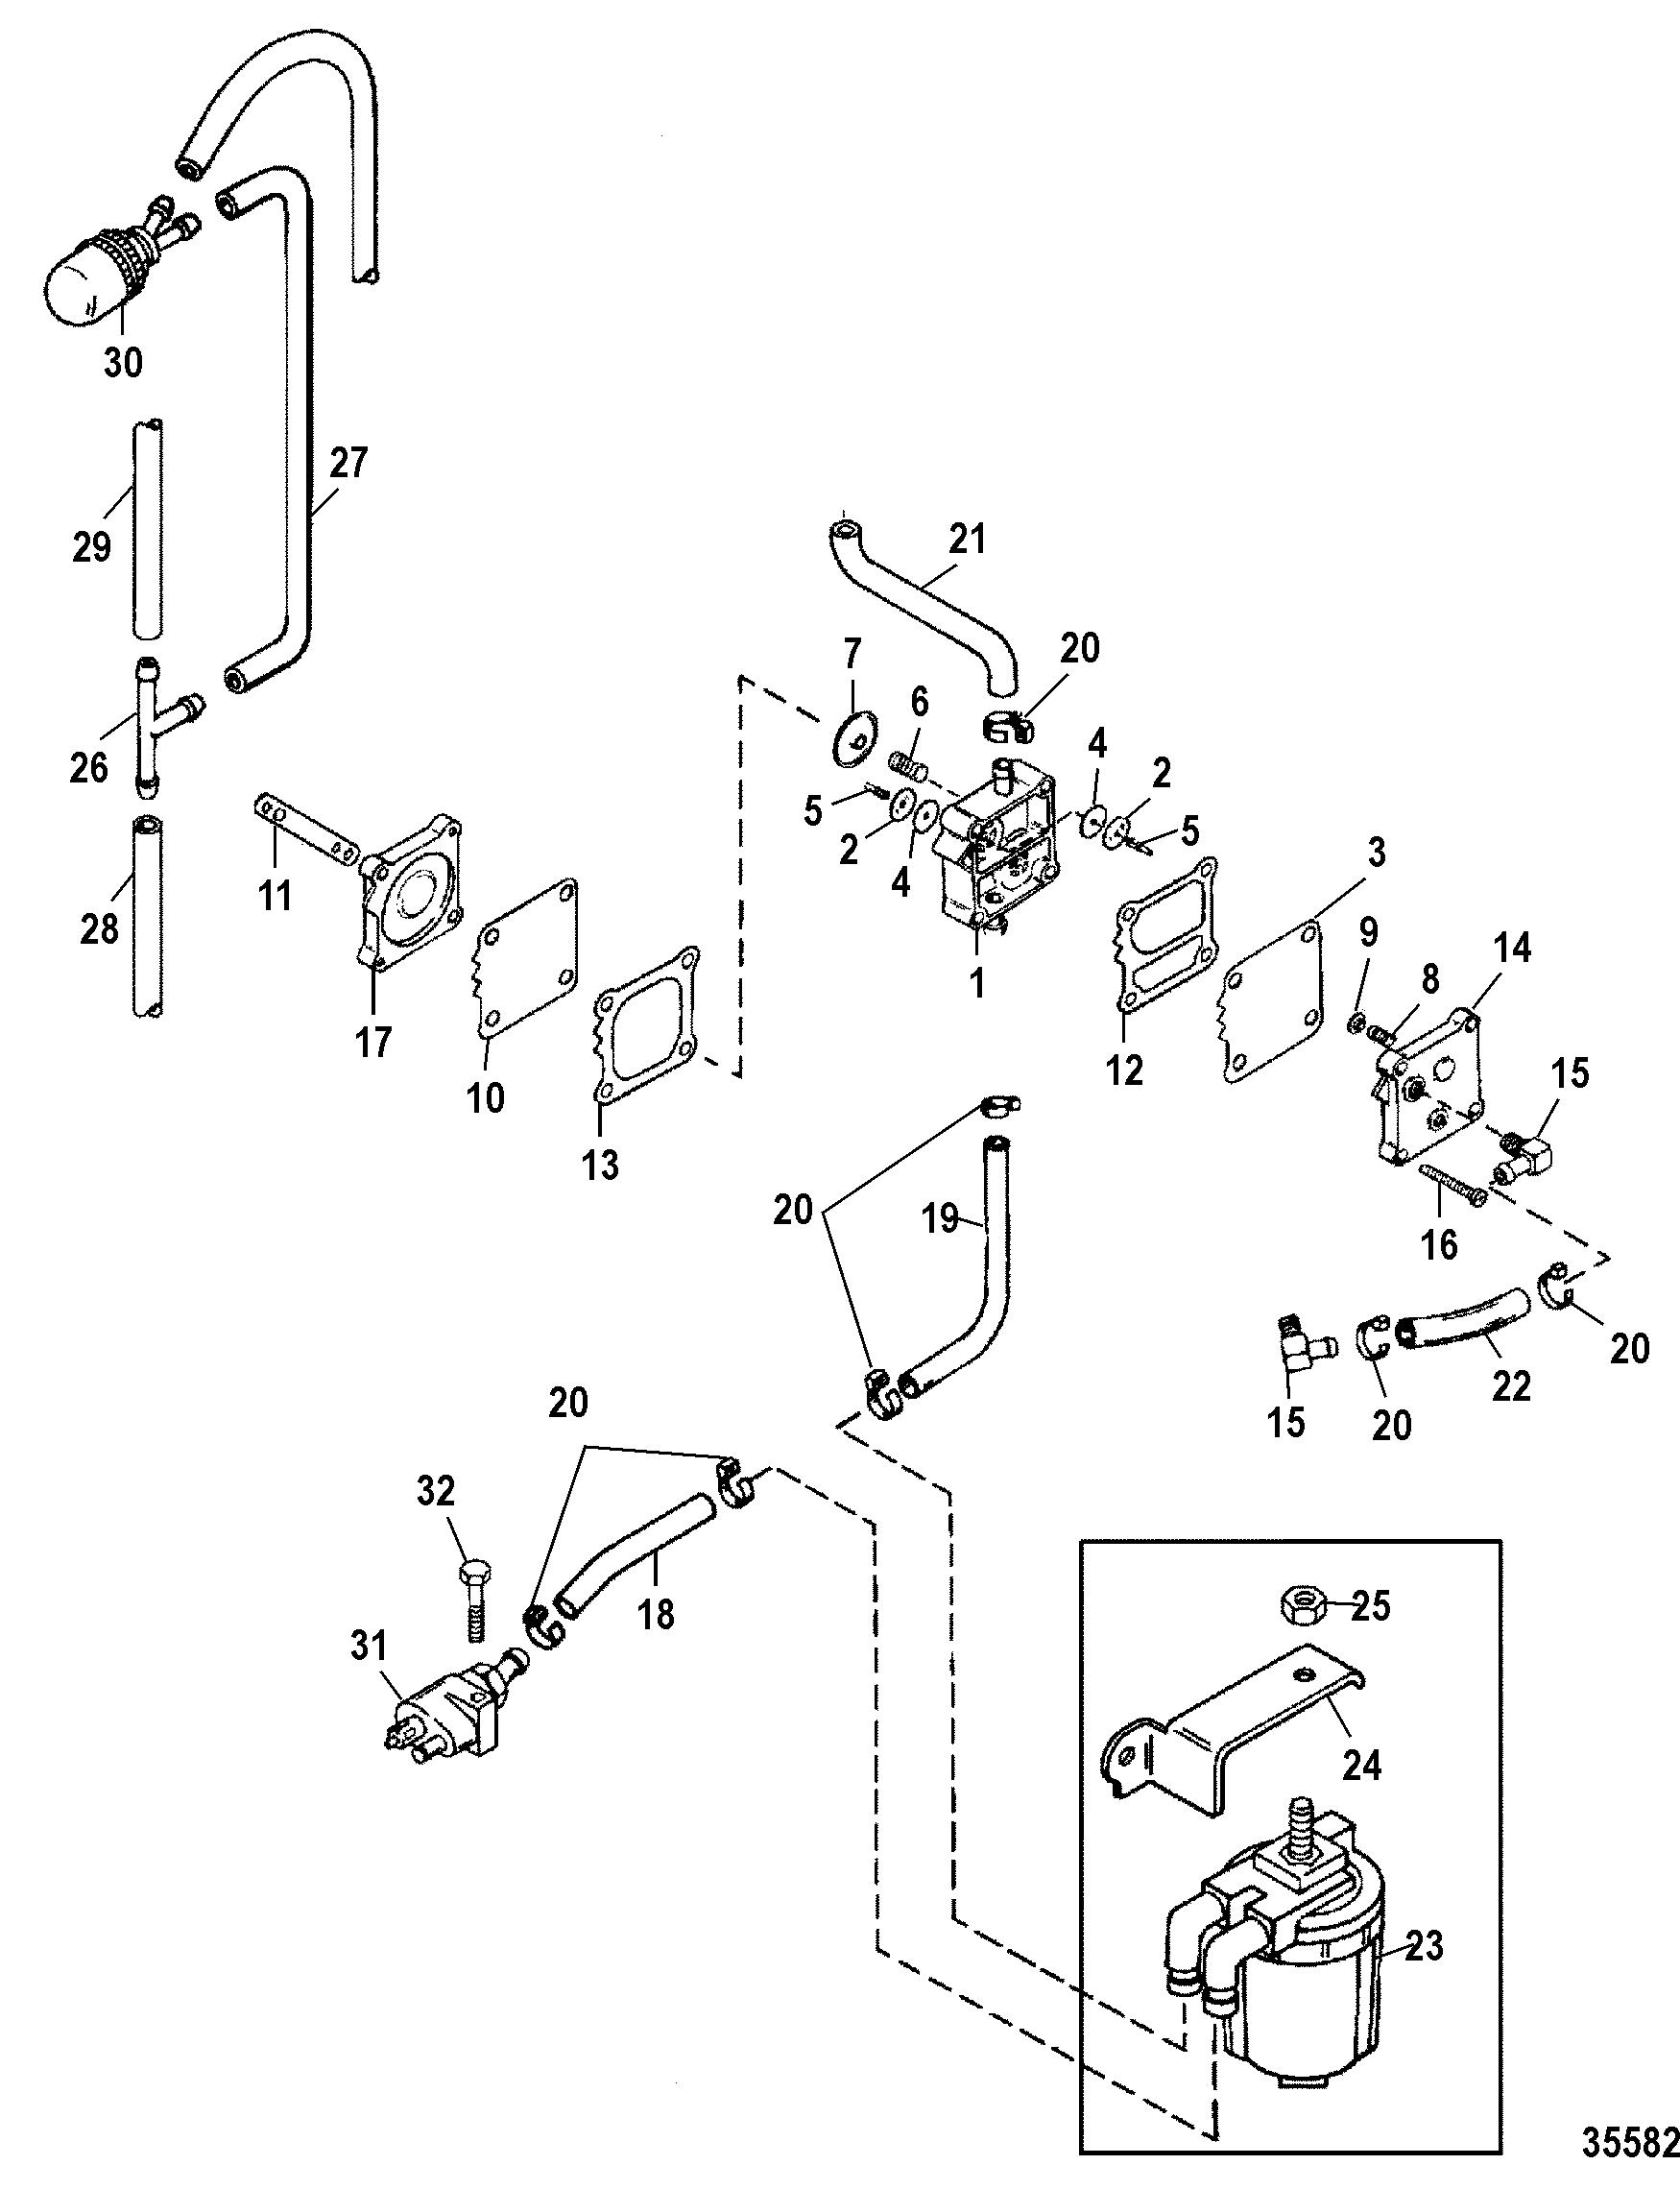 Fuel Pump, Manual FOR MARINER / MERCURY 55/60/45 JET/60